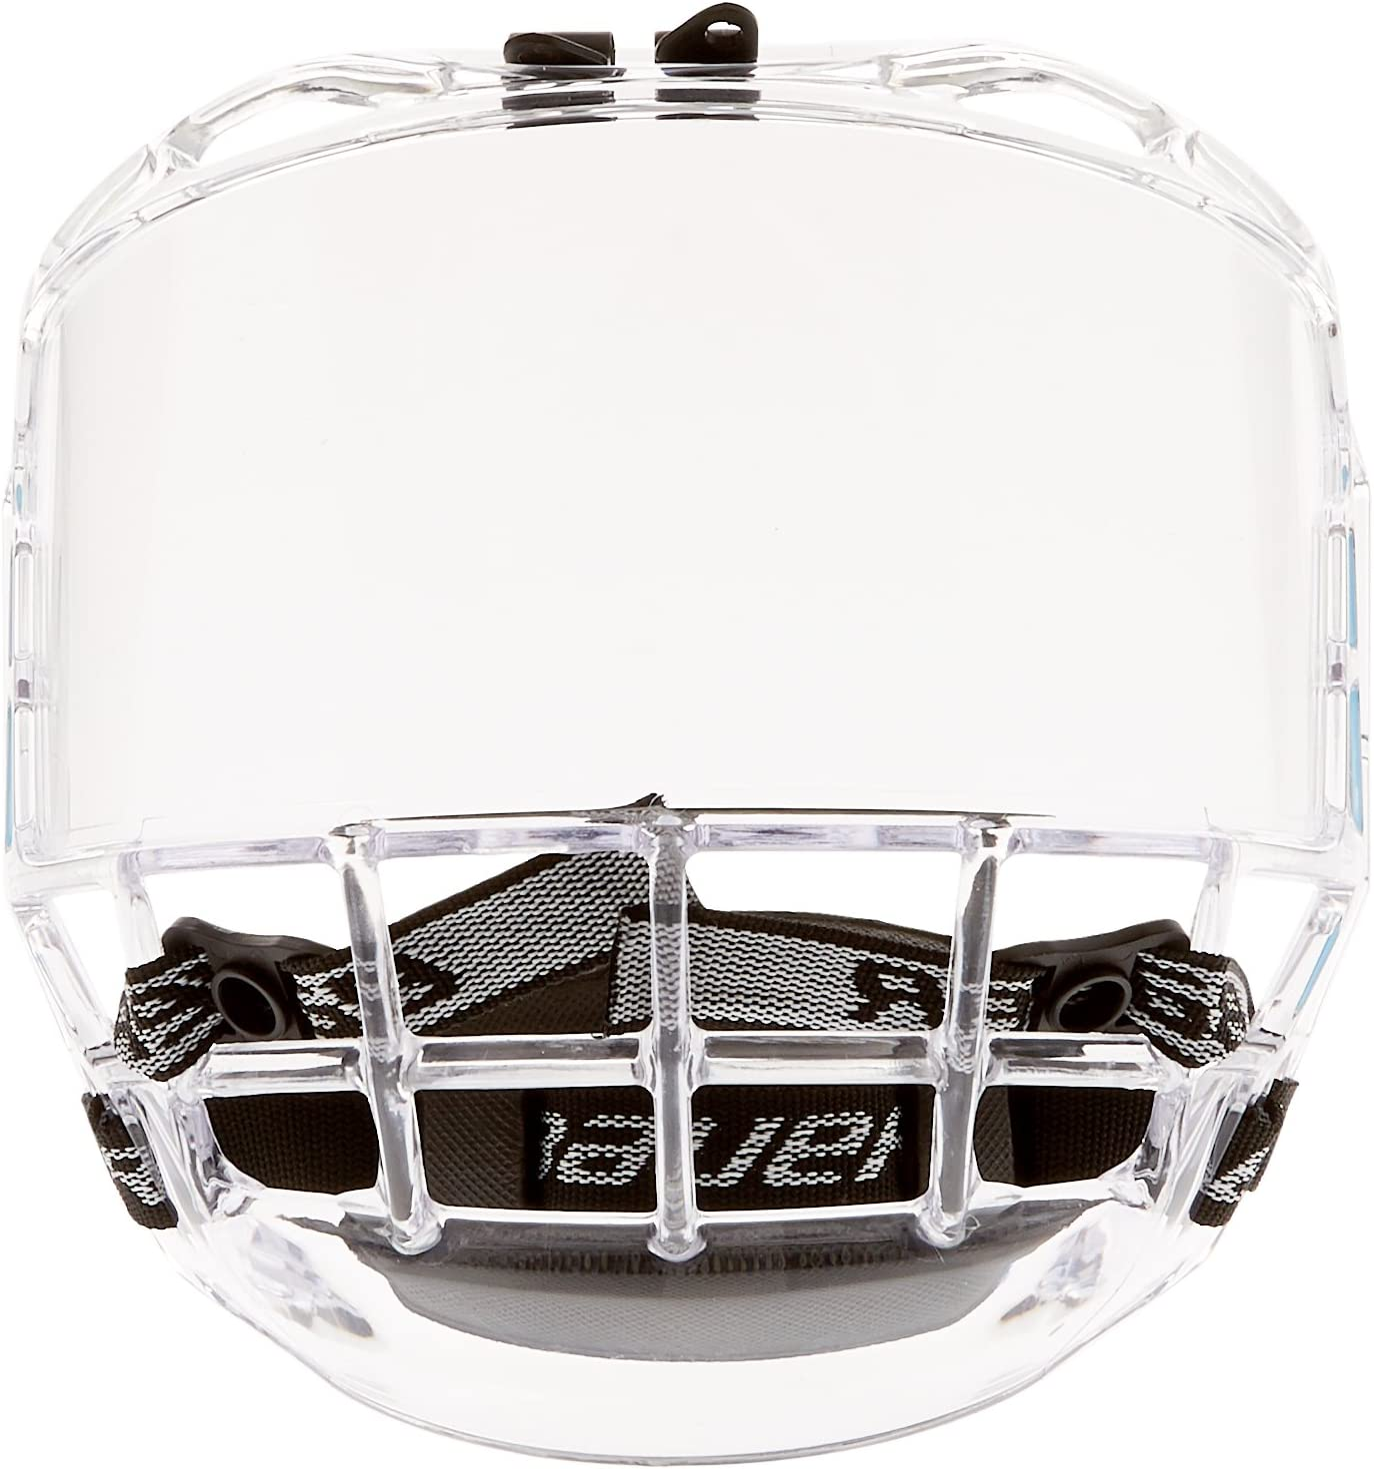 Bauer Concept 3 Face Shield